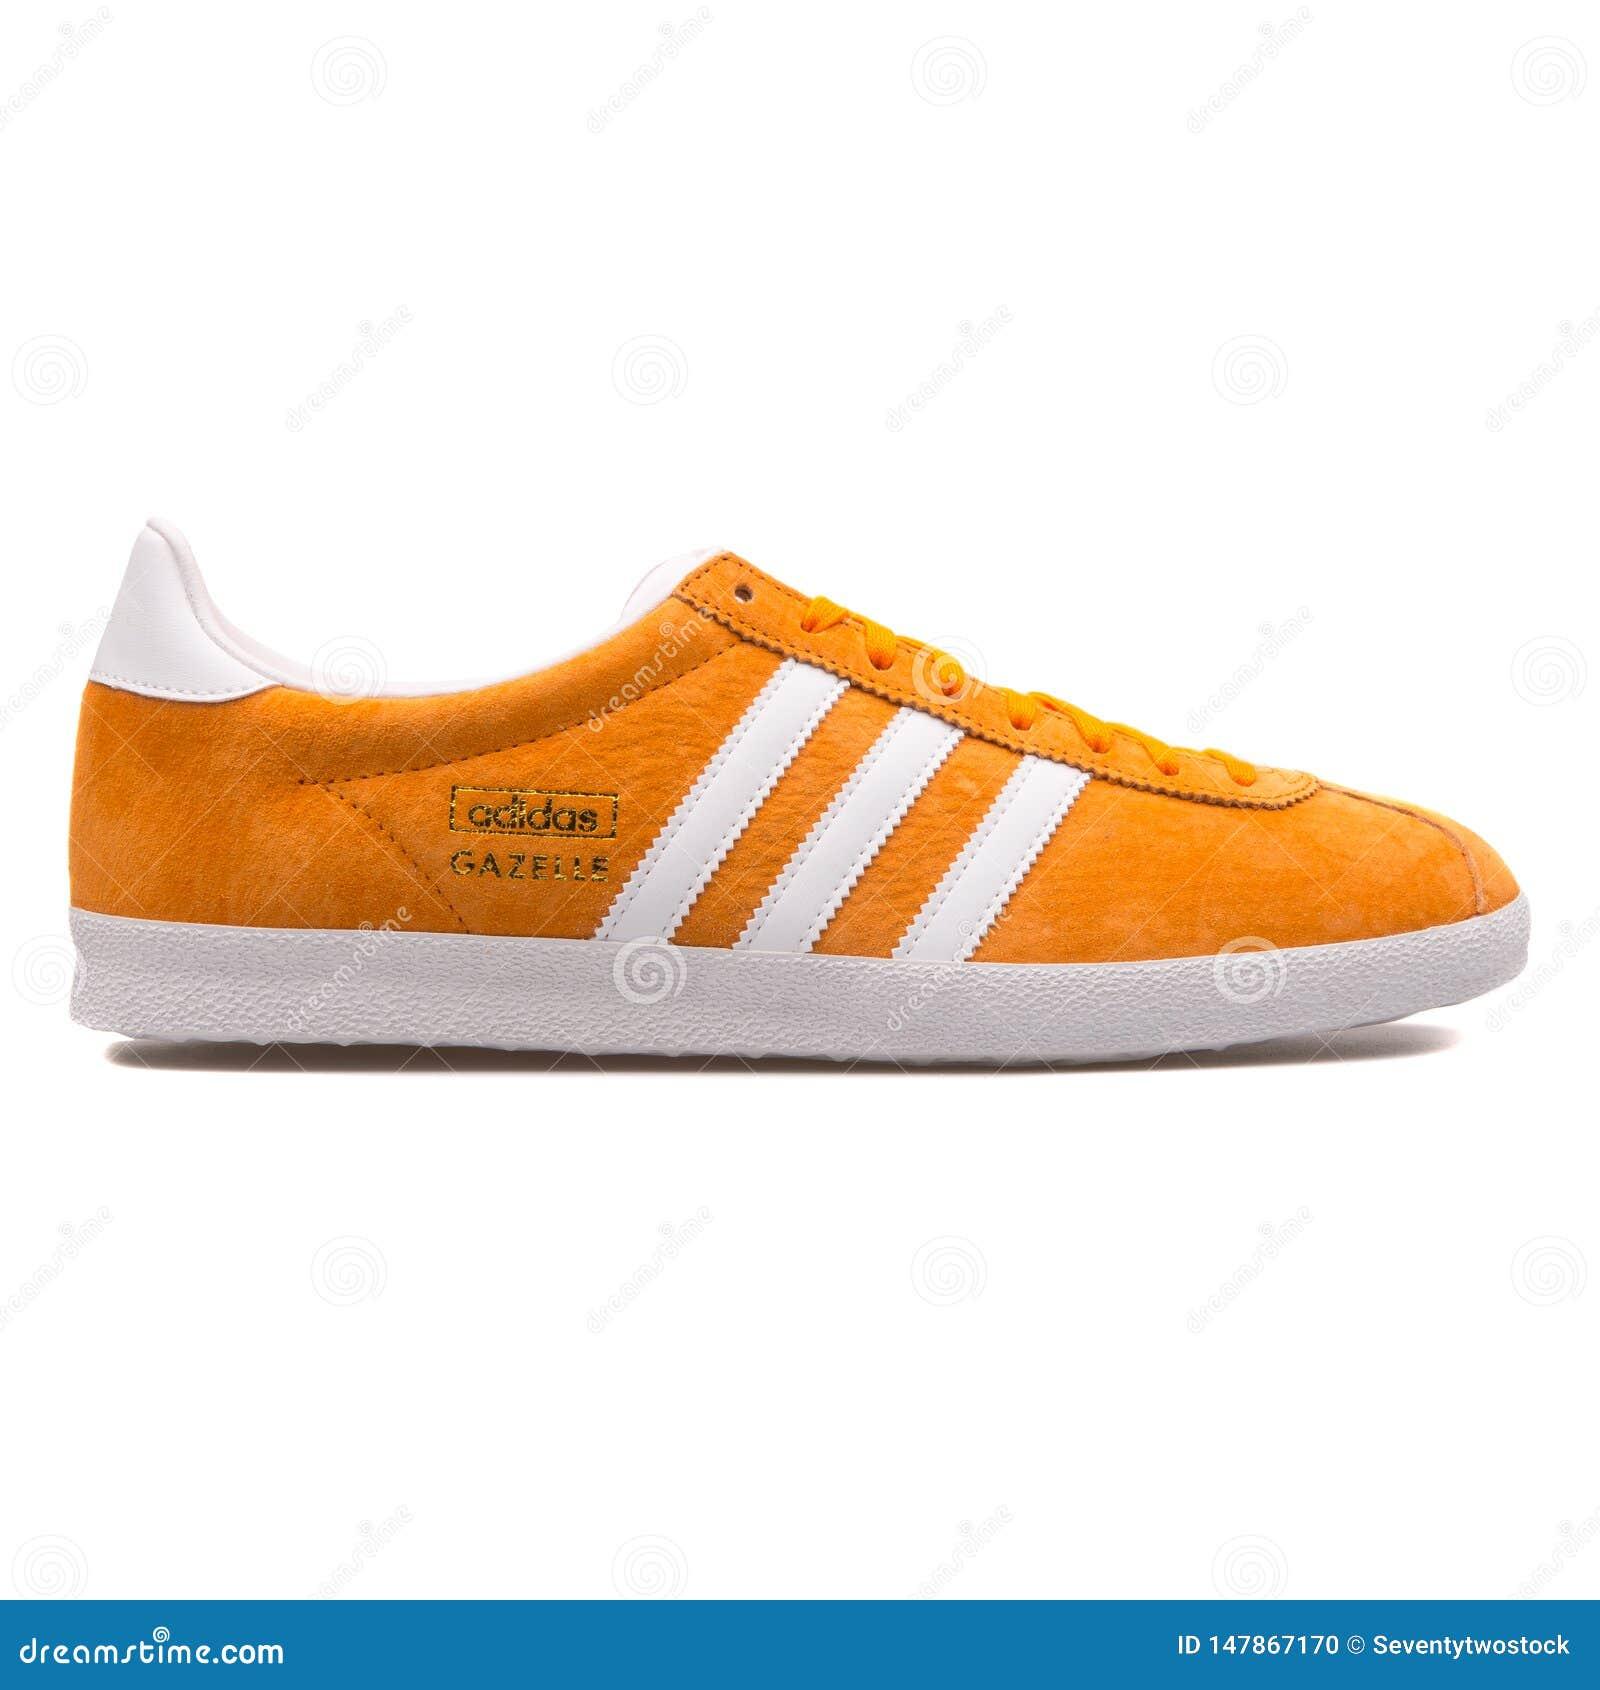 Adidas Gazelle OG Orange And White Sneaker Editorial Image ...